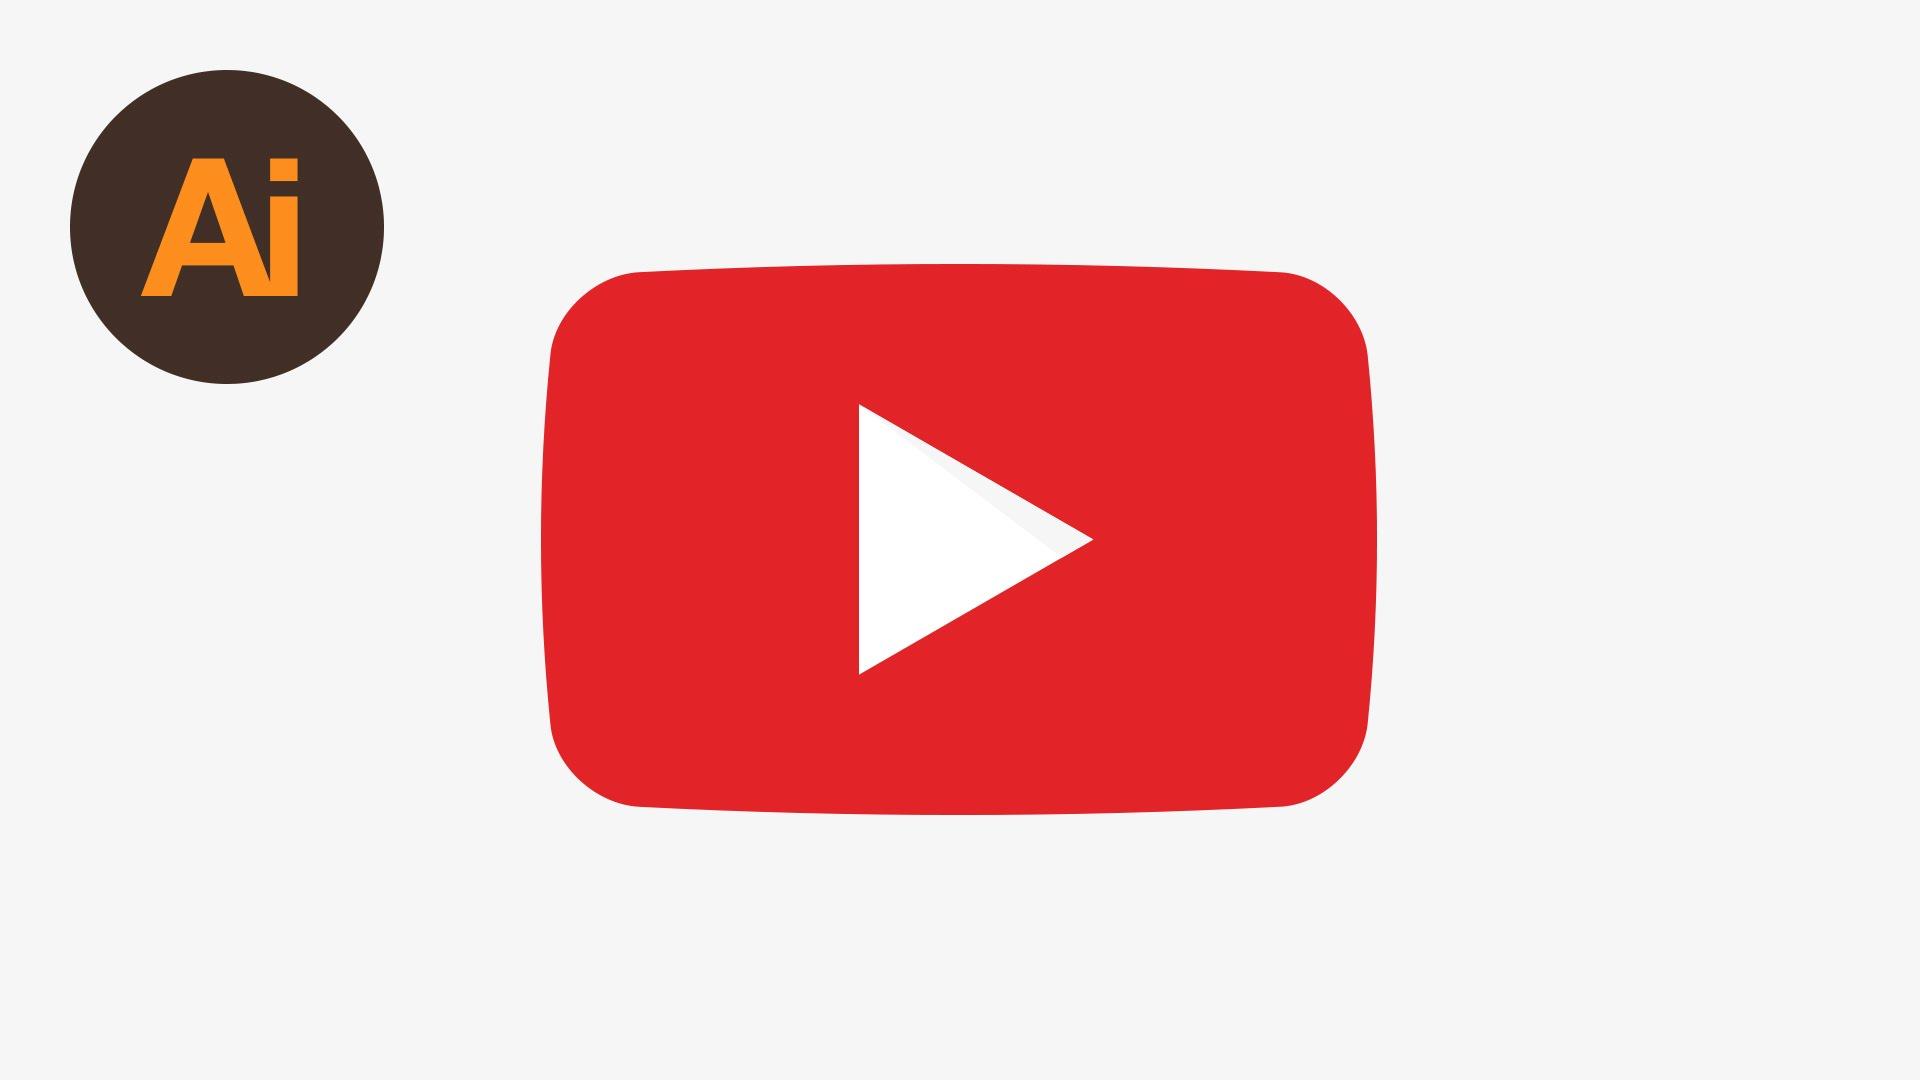 1920x1080 How To Draw Youtube Logos